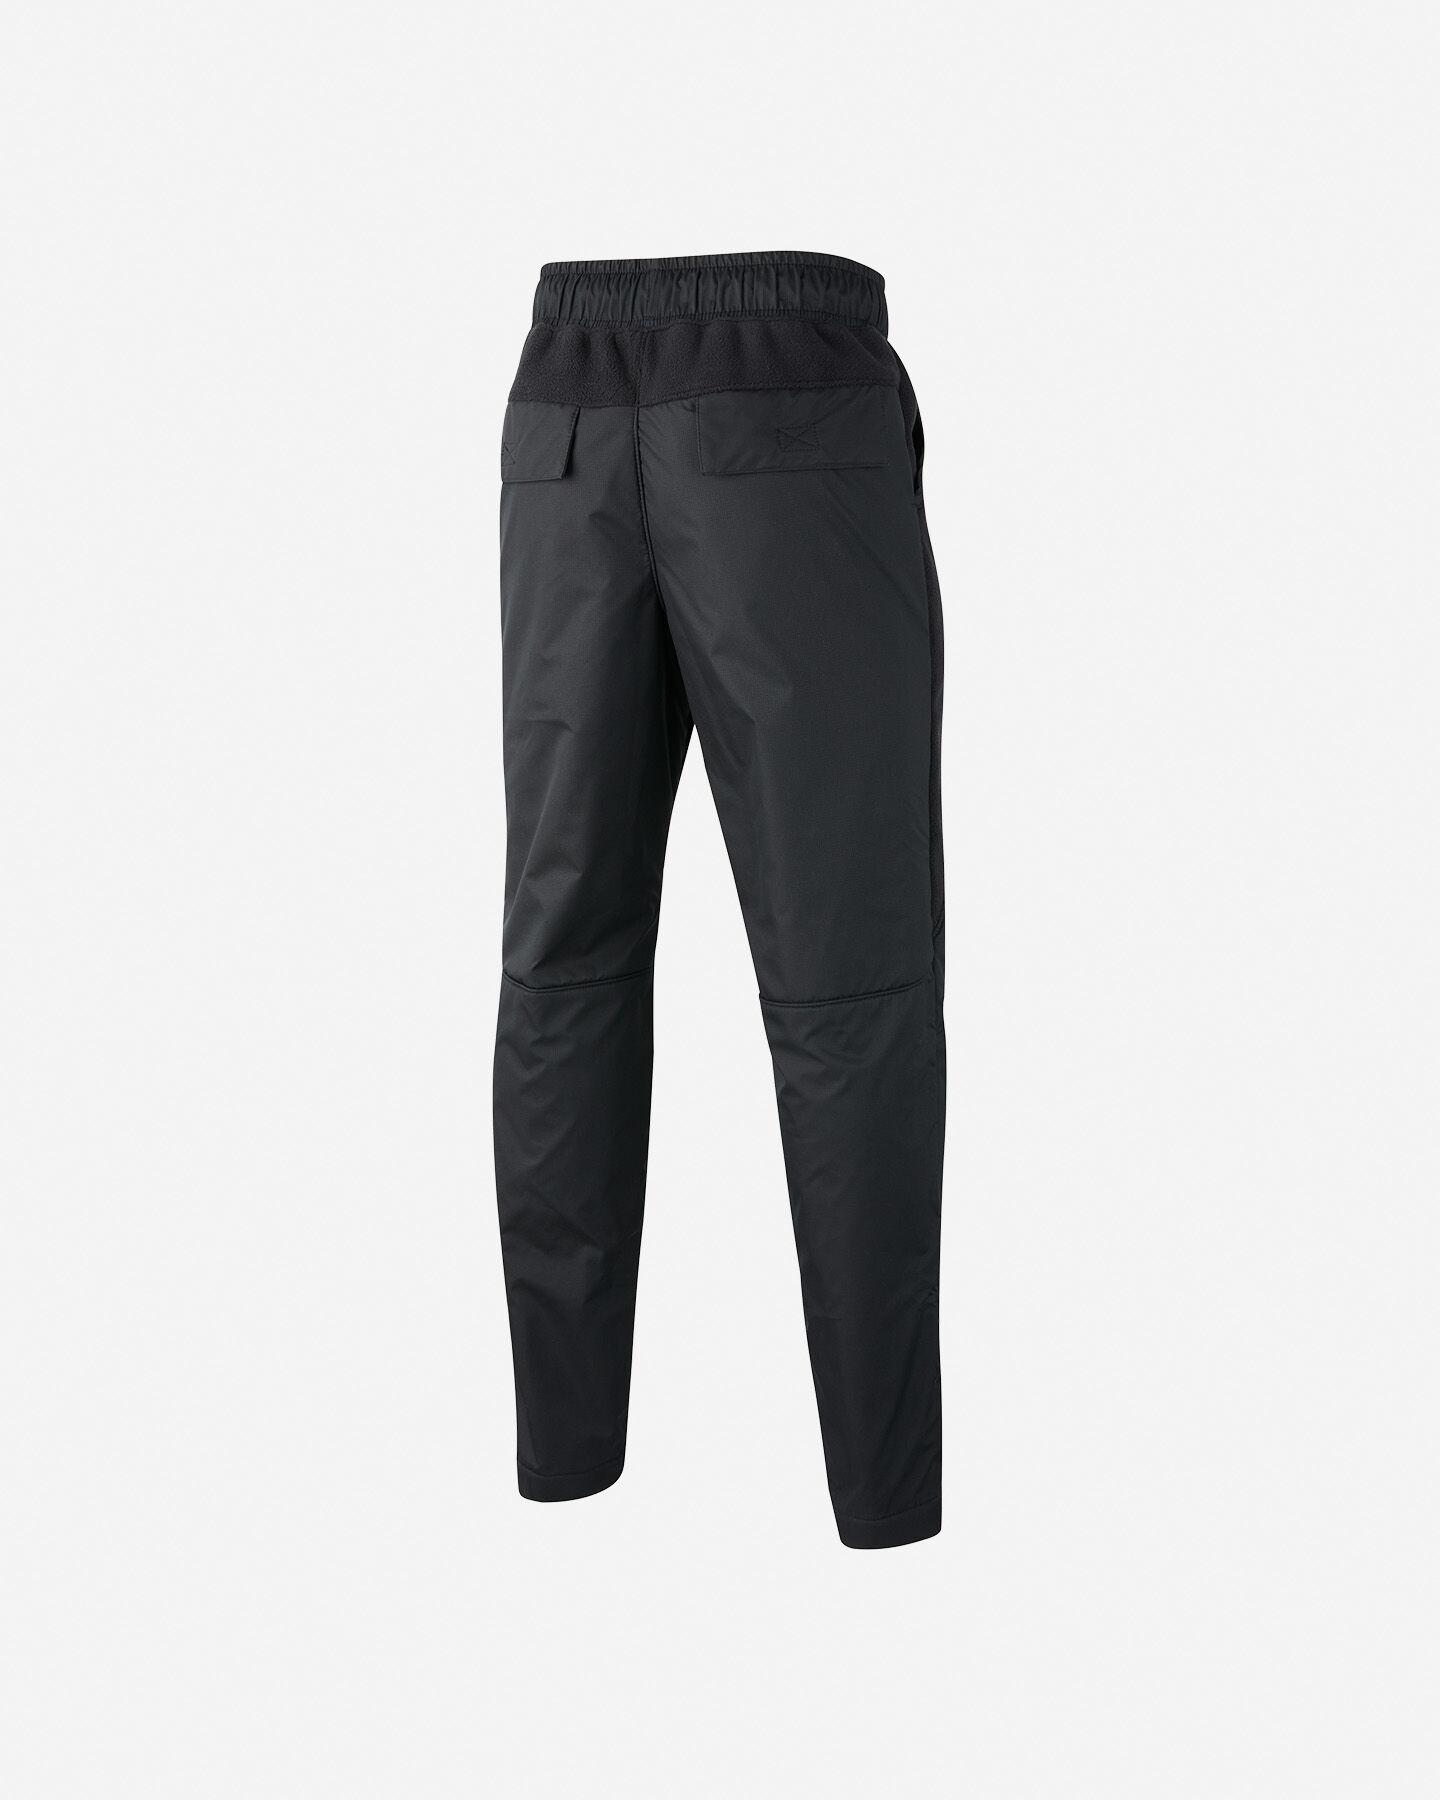 Pantalone NIKE AIR JR S5247338 scatto 1